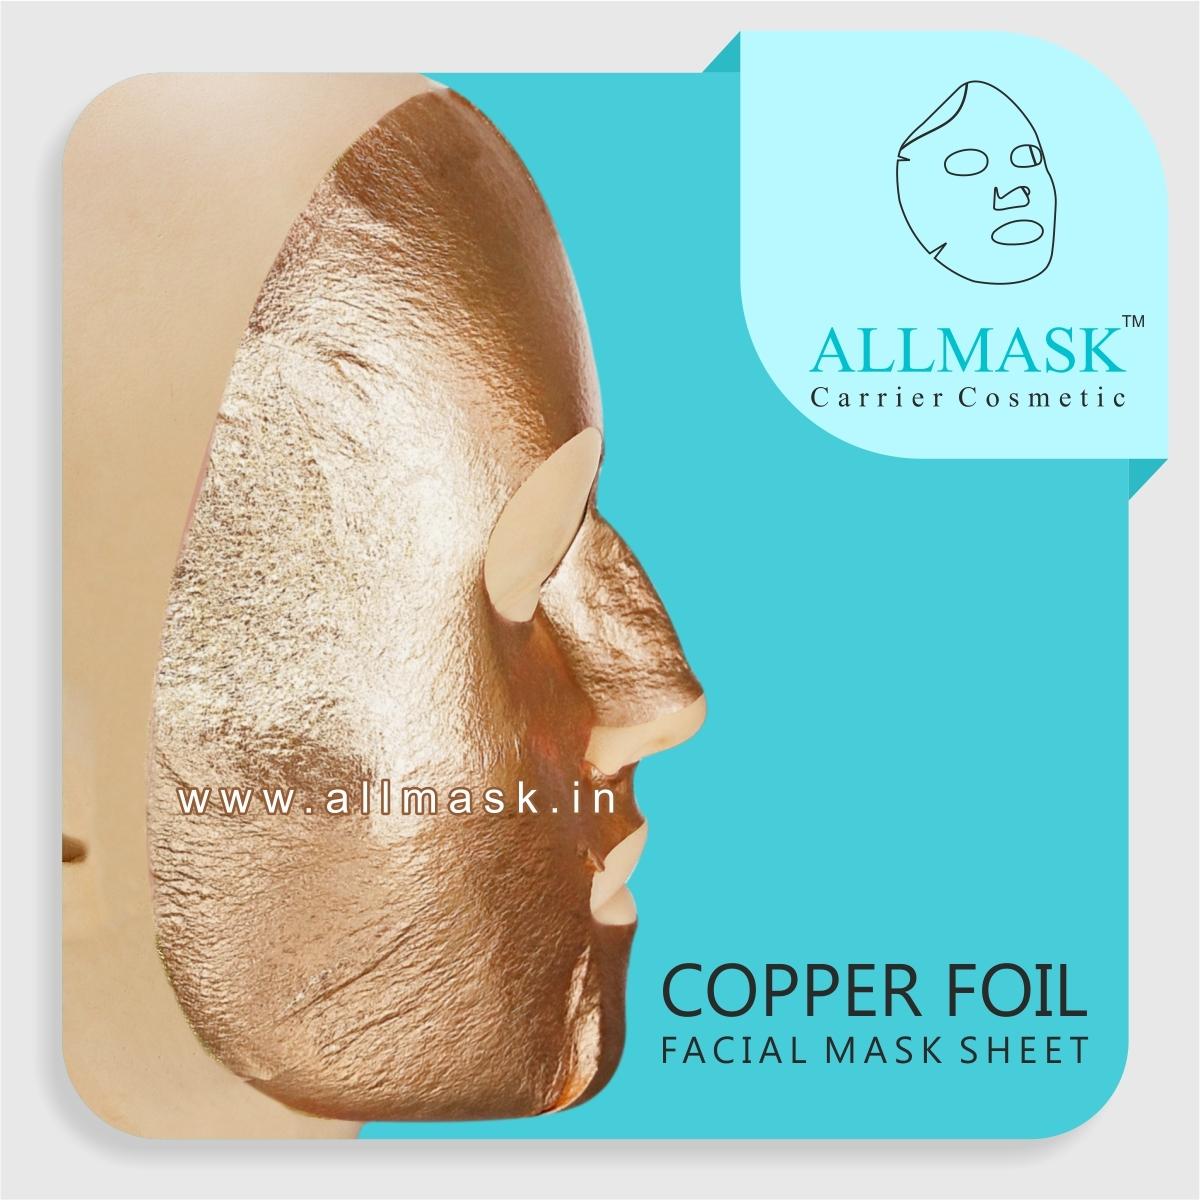 Copper Facial Mask Sheet - 100% Original - ODM/OEM Customization Available